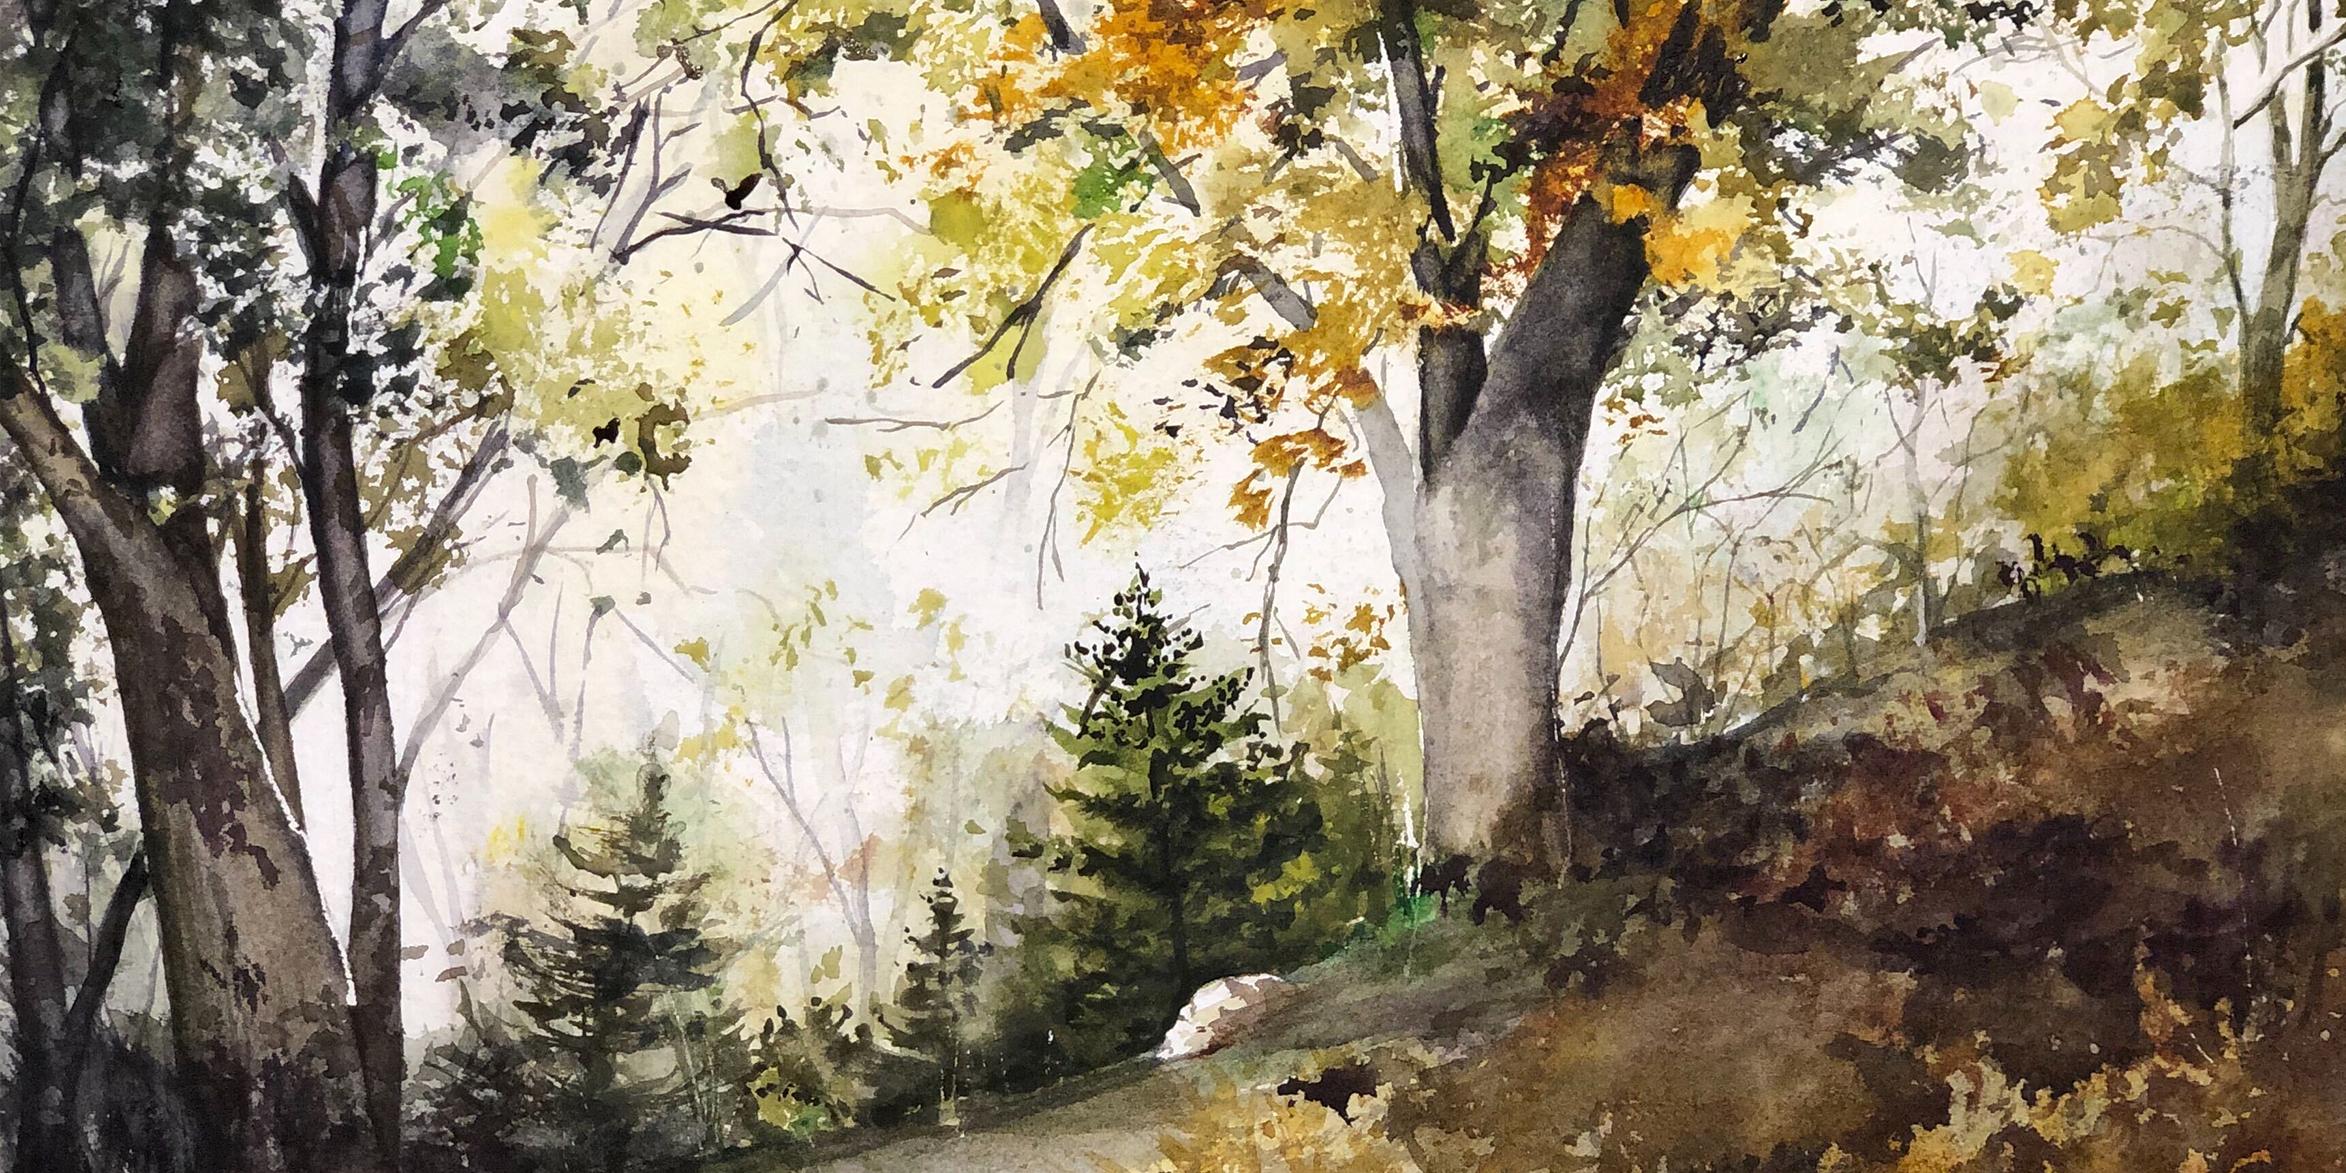 Ray Hendershot Exercise: Fully Foliated Trees